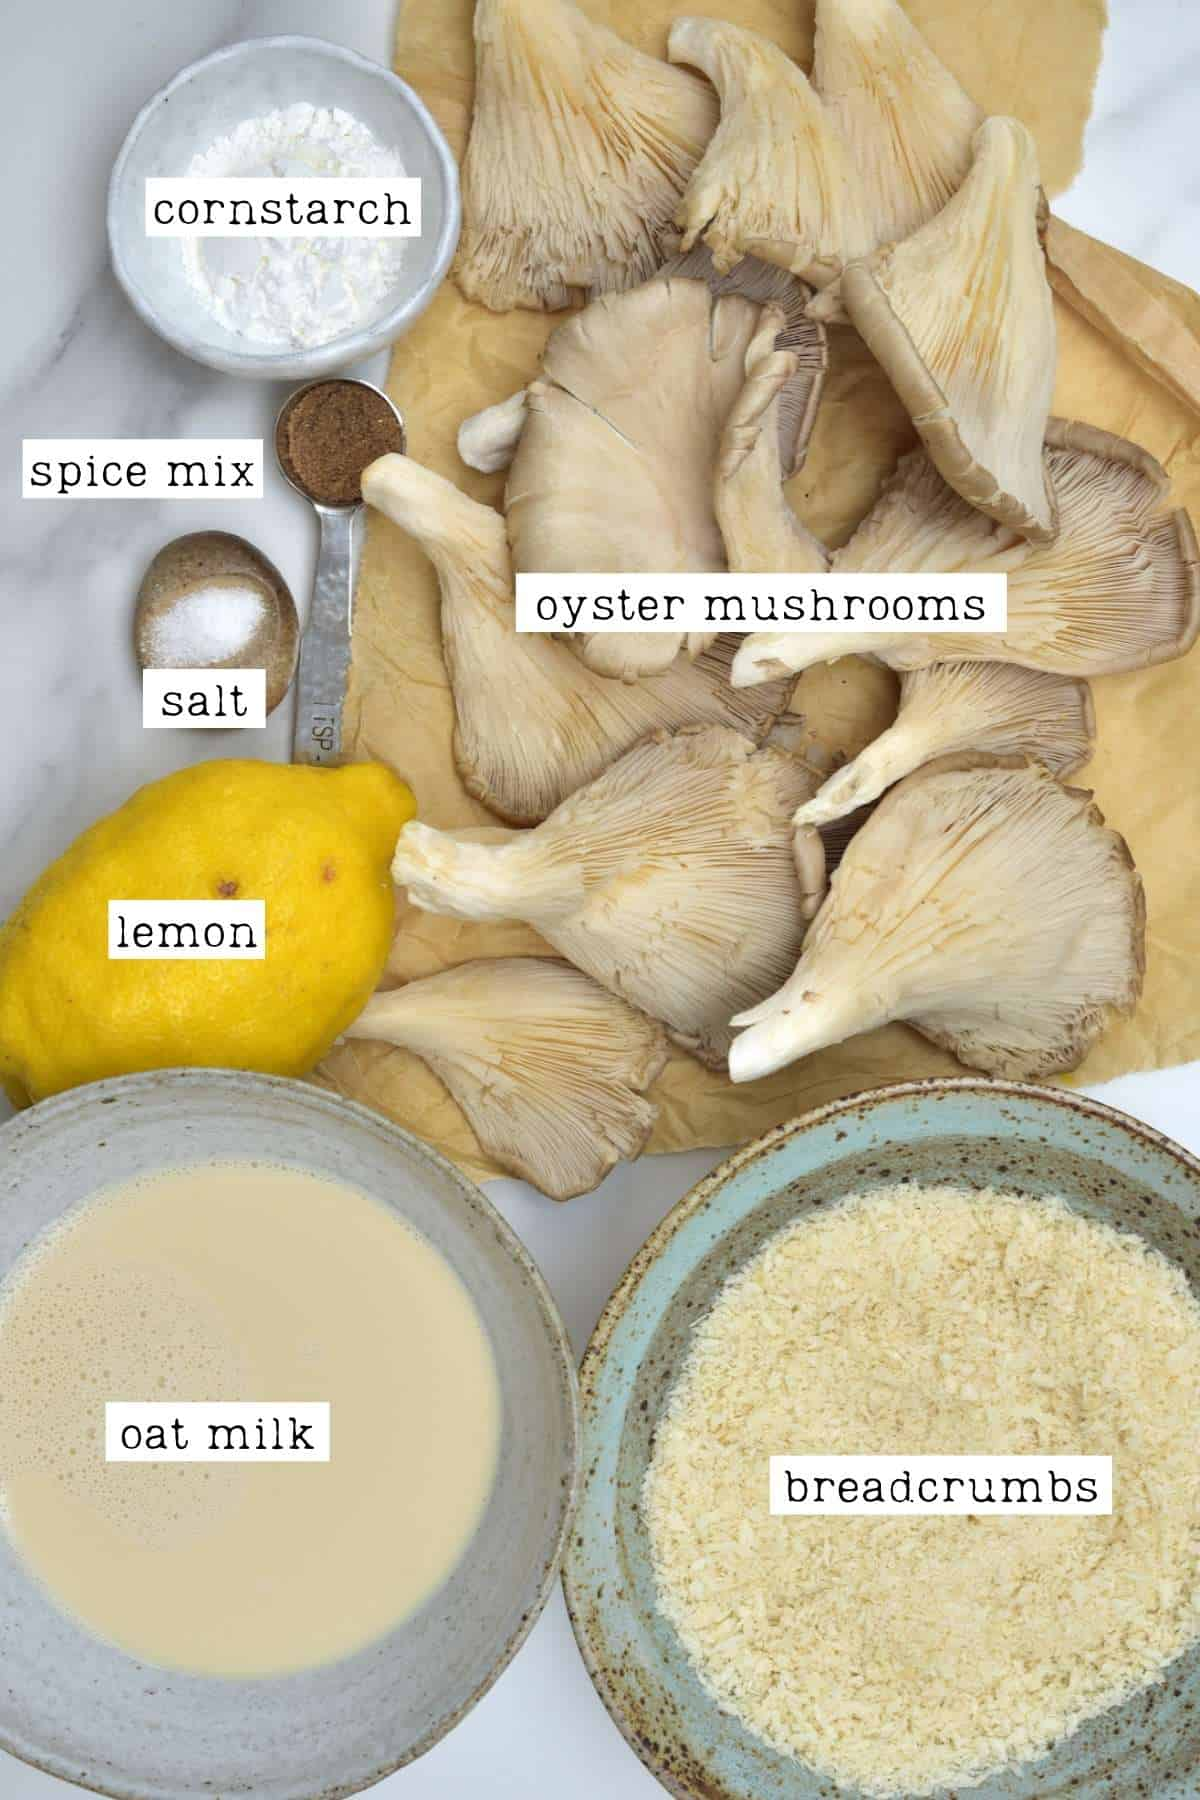 Ingredients for crispy oyster mushrooms